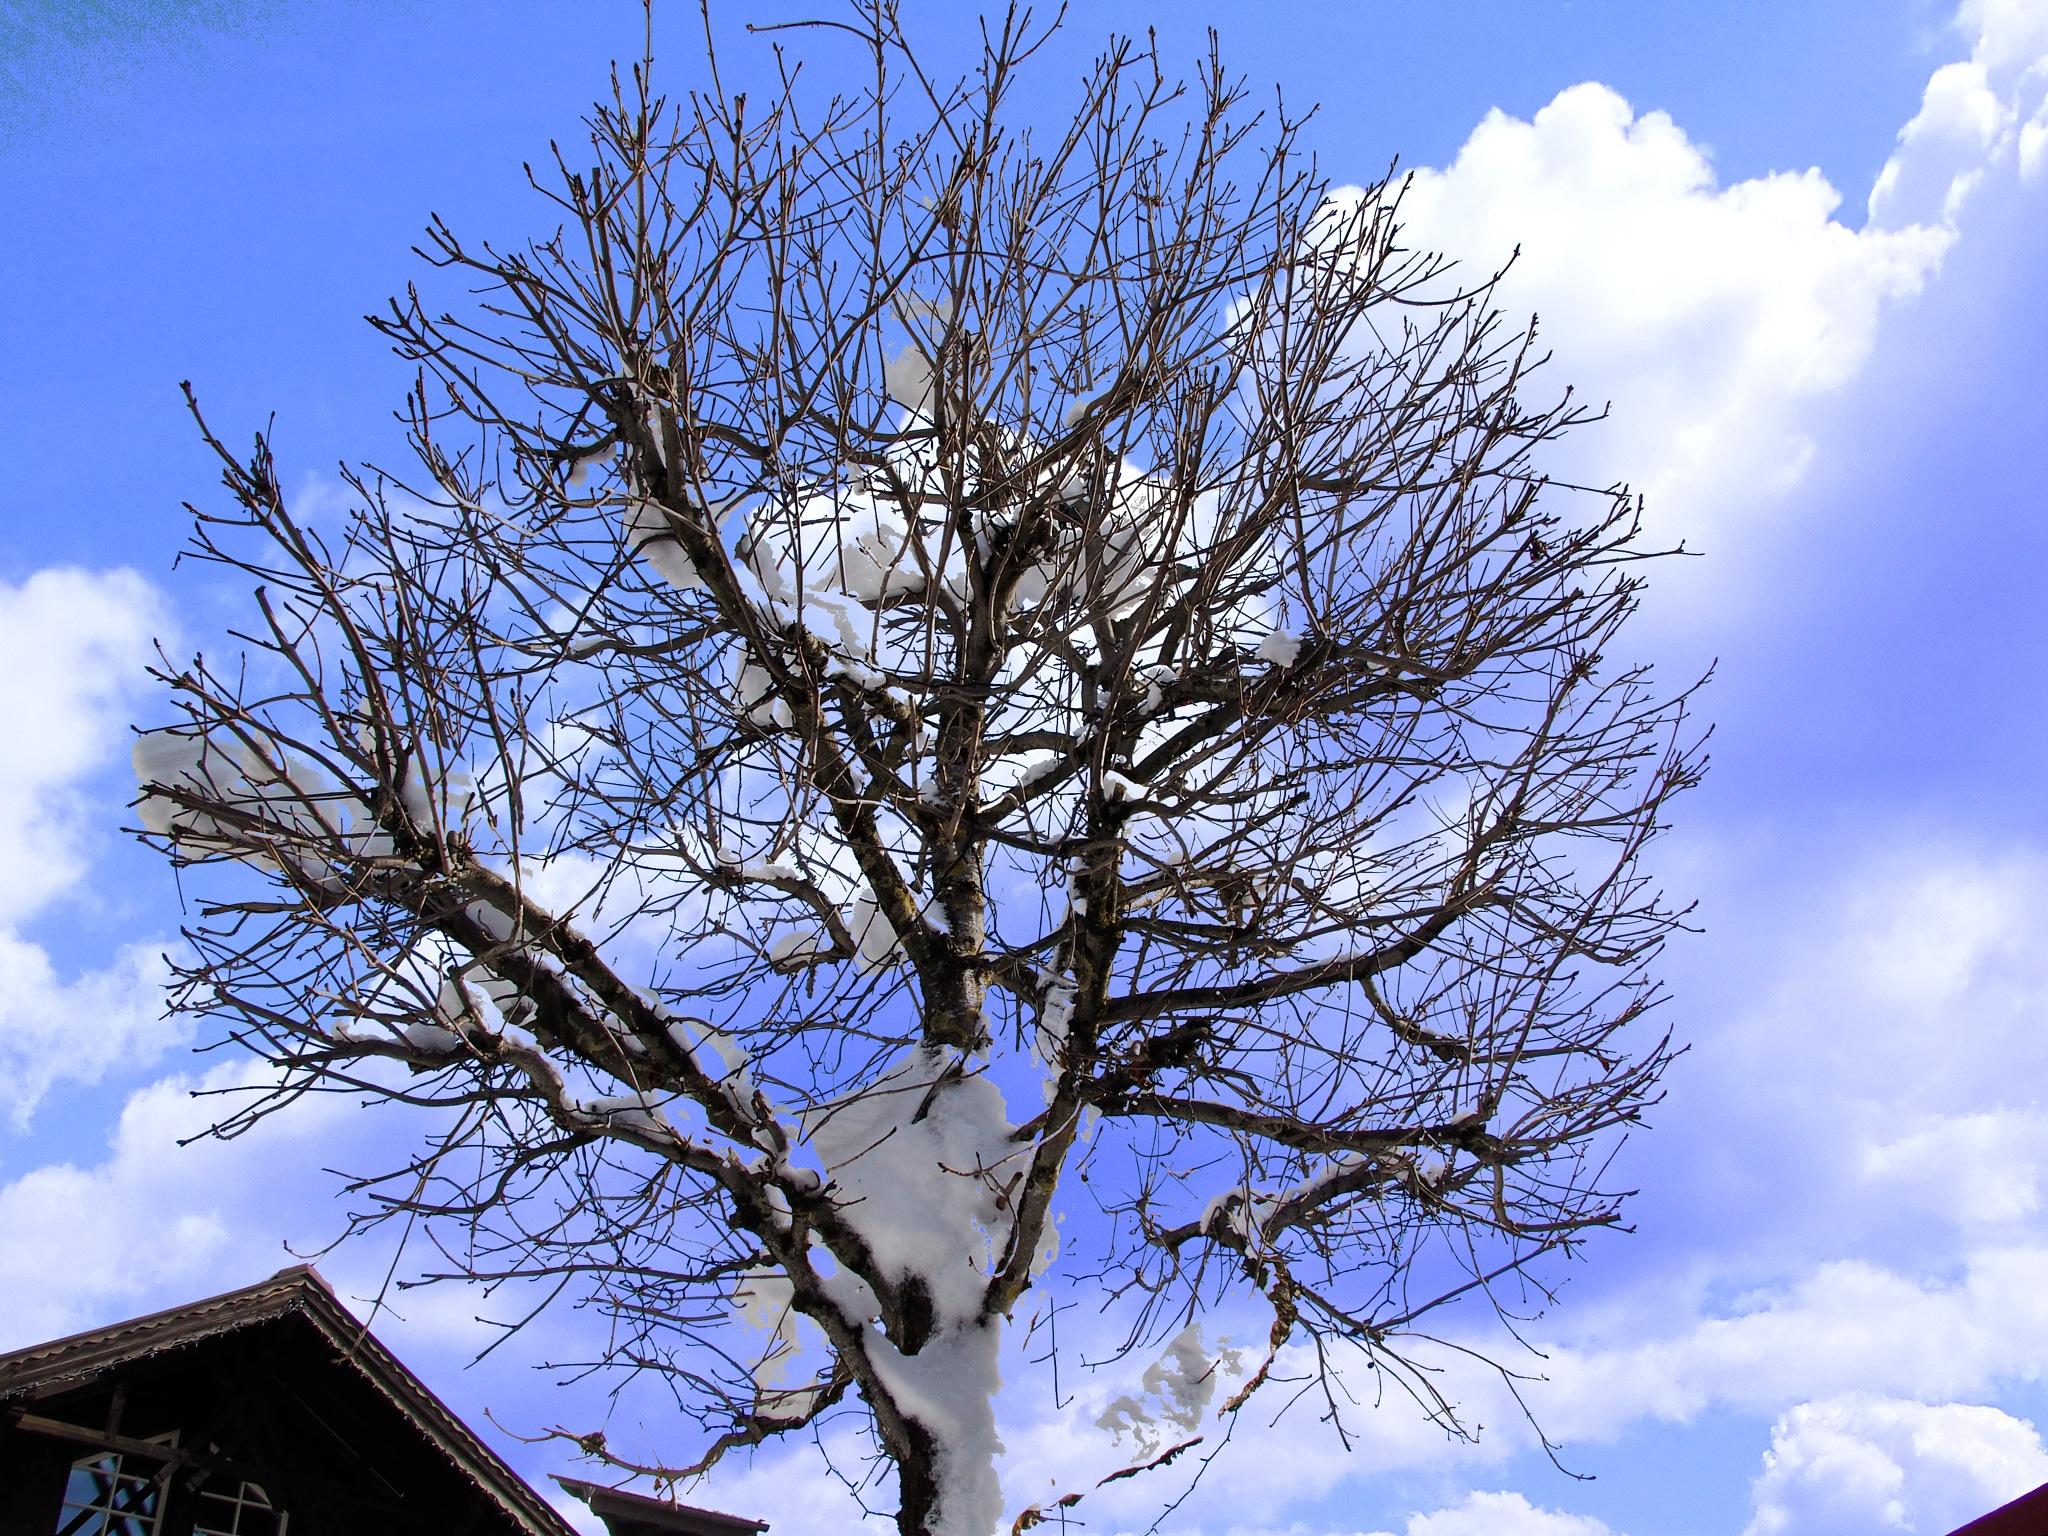 Winter leafs  by Florian B